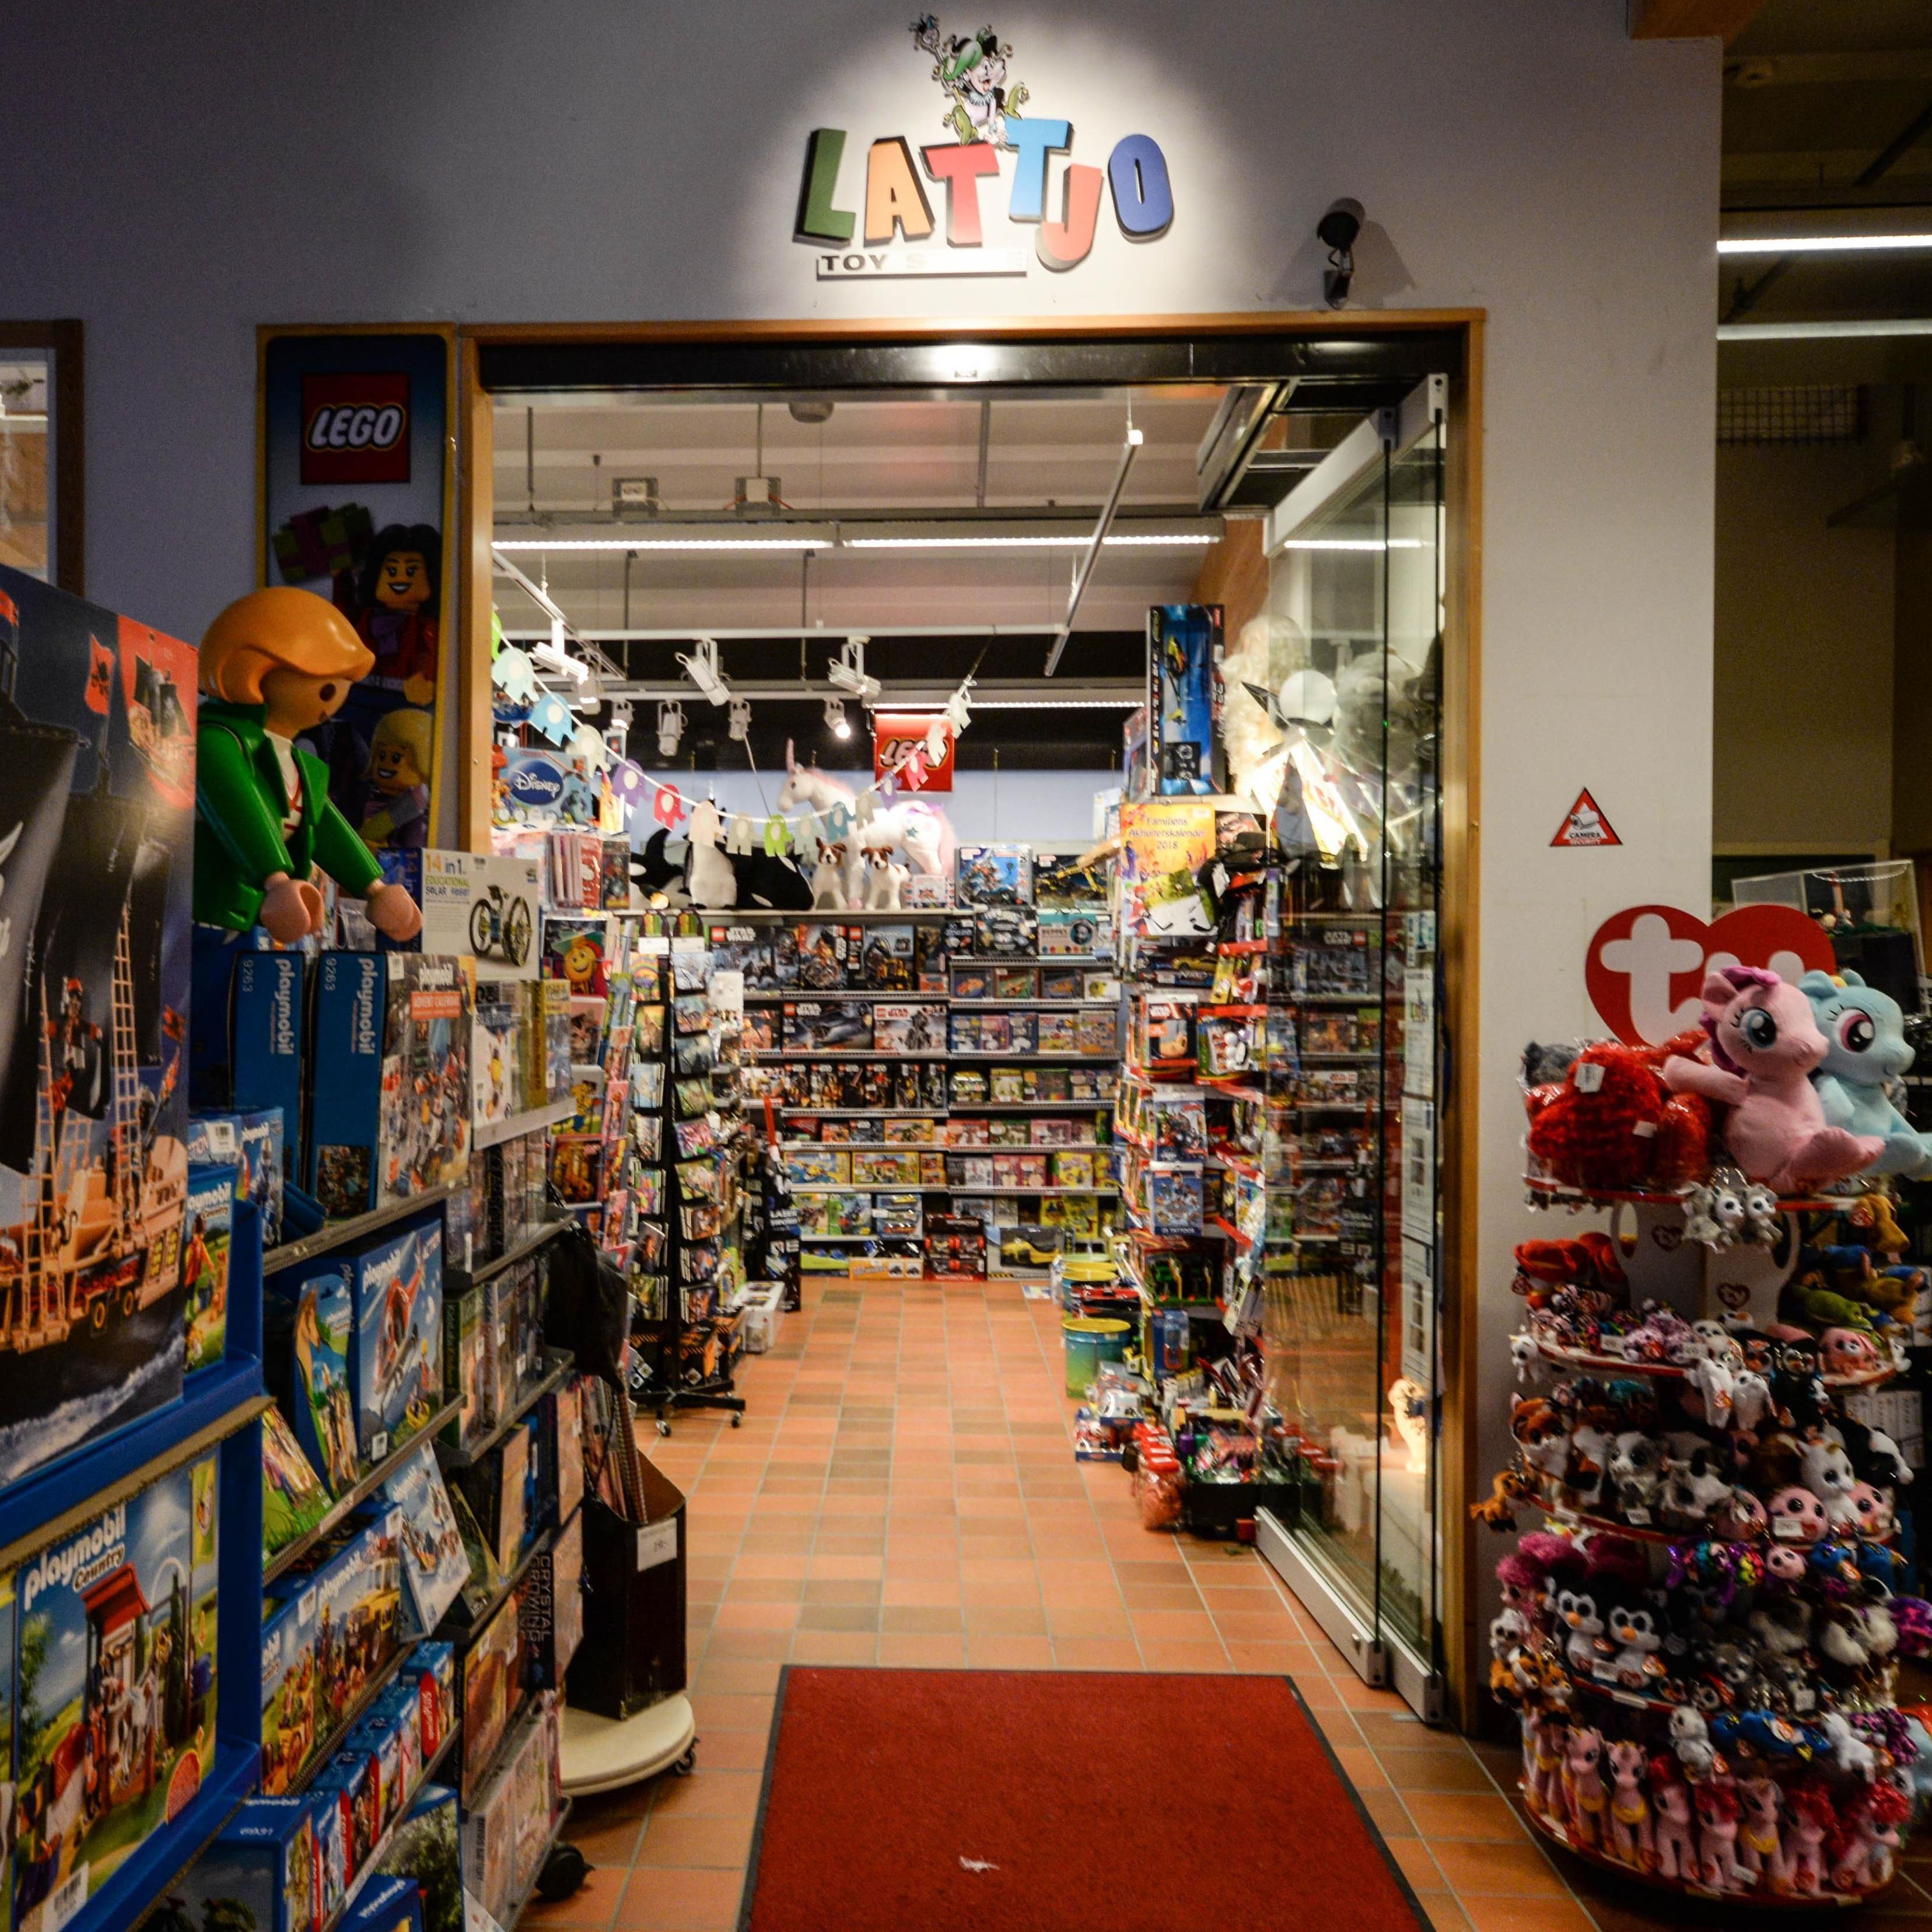 Lattjo Toy Store